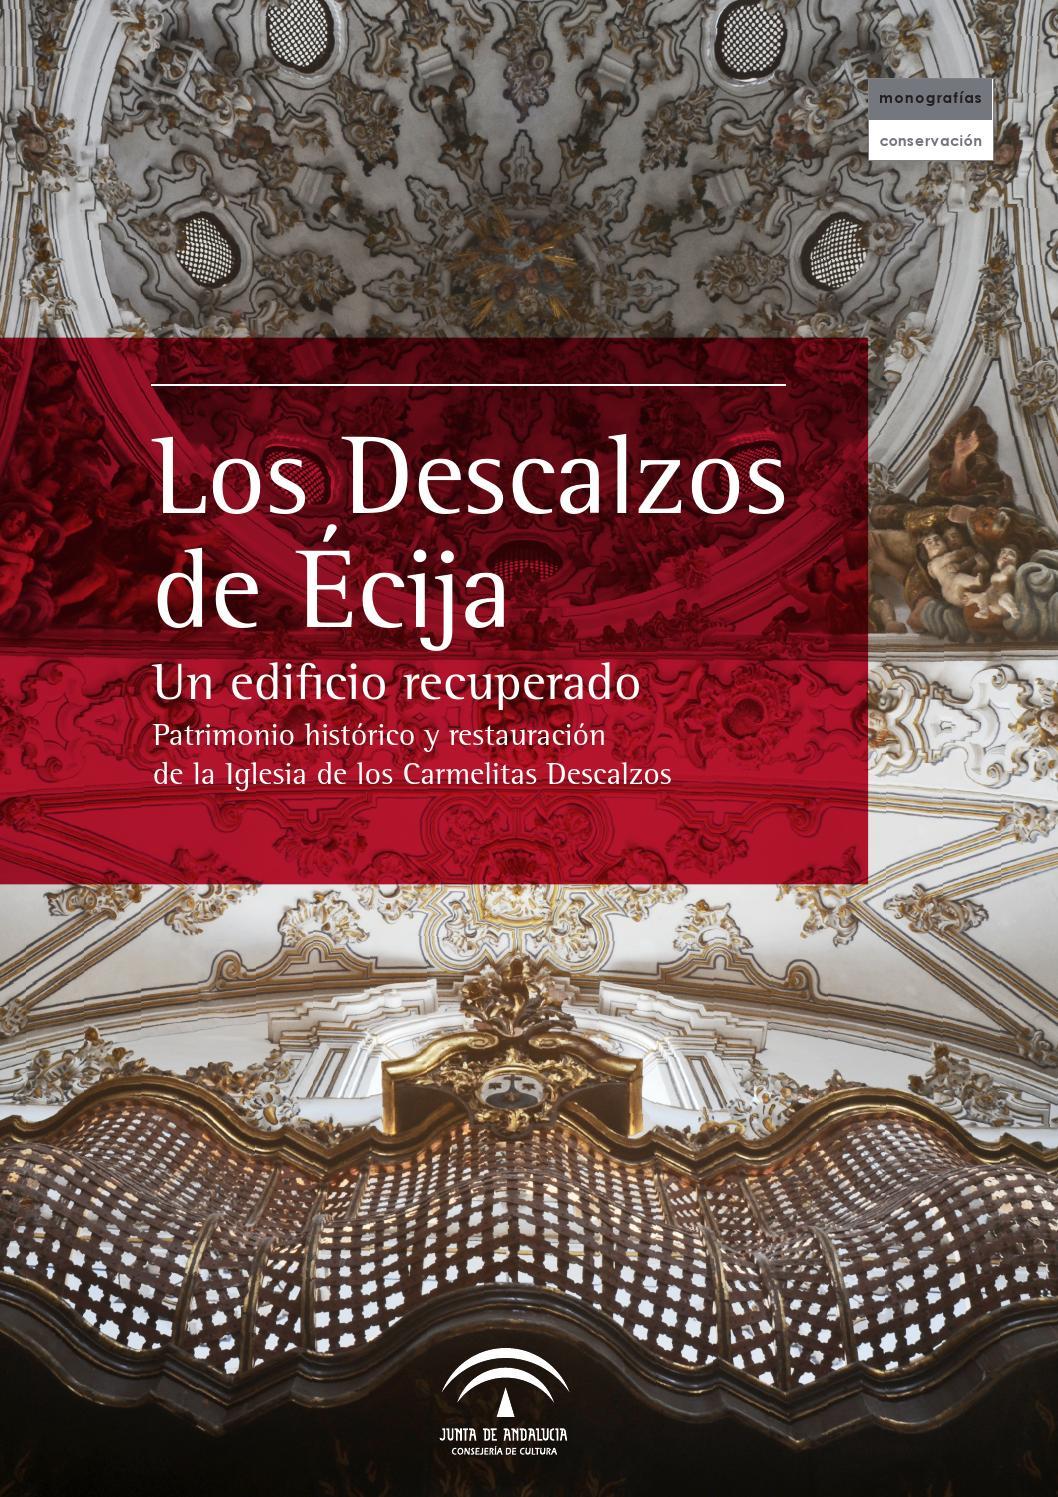 AA. VV. Los Descalzos de Écija. 2011 by Ecijateca - issuu 8e708ffa5c5